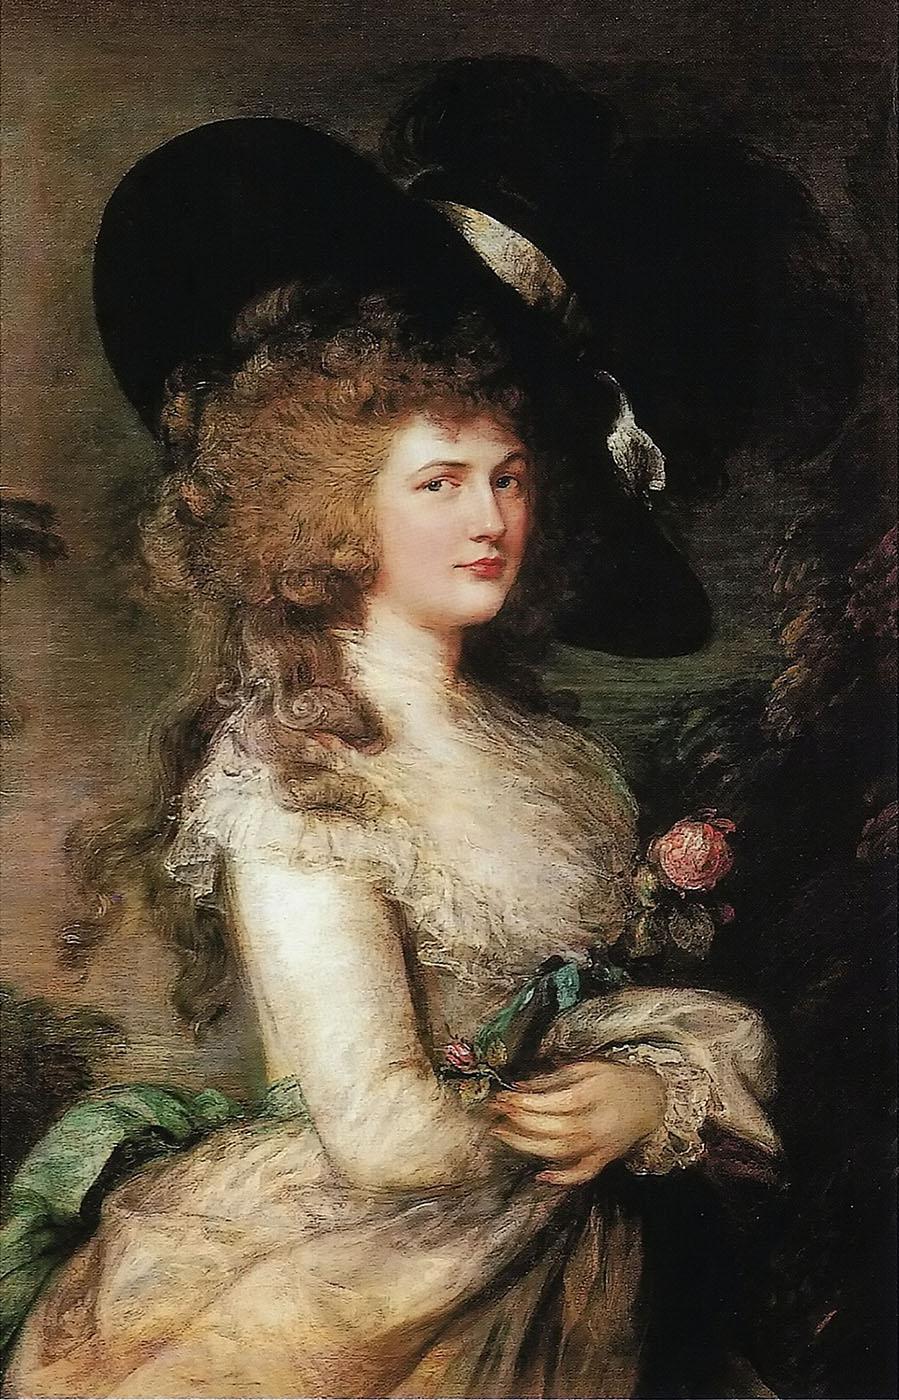 Thomas Gainsborough. Retrato de la duquesa de Devonshire. Hacia 1785-1787. Chatsworth House.